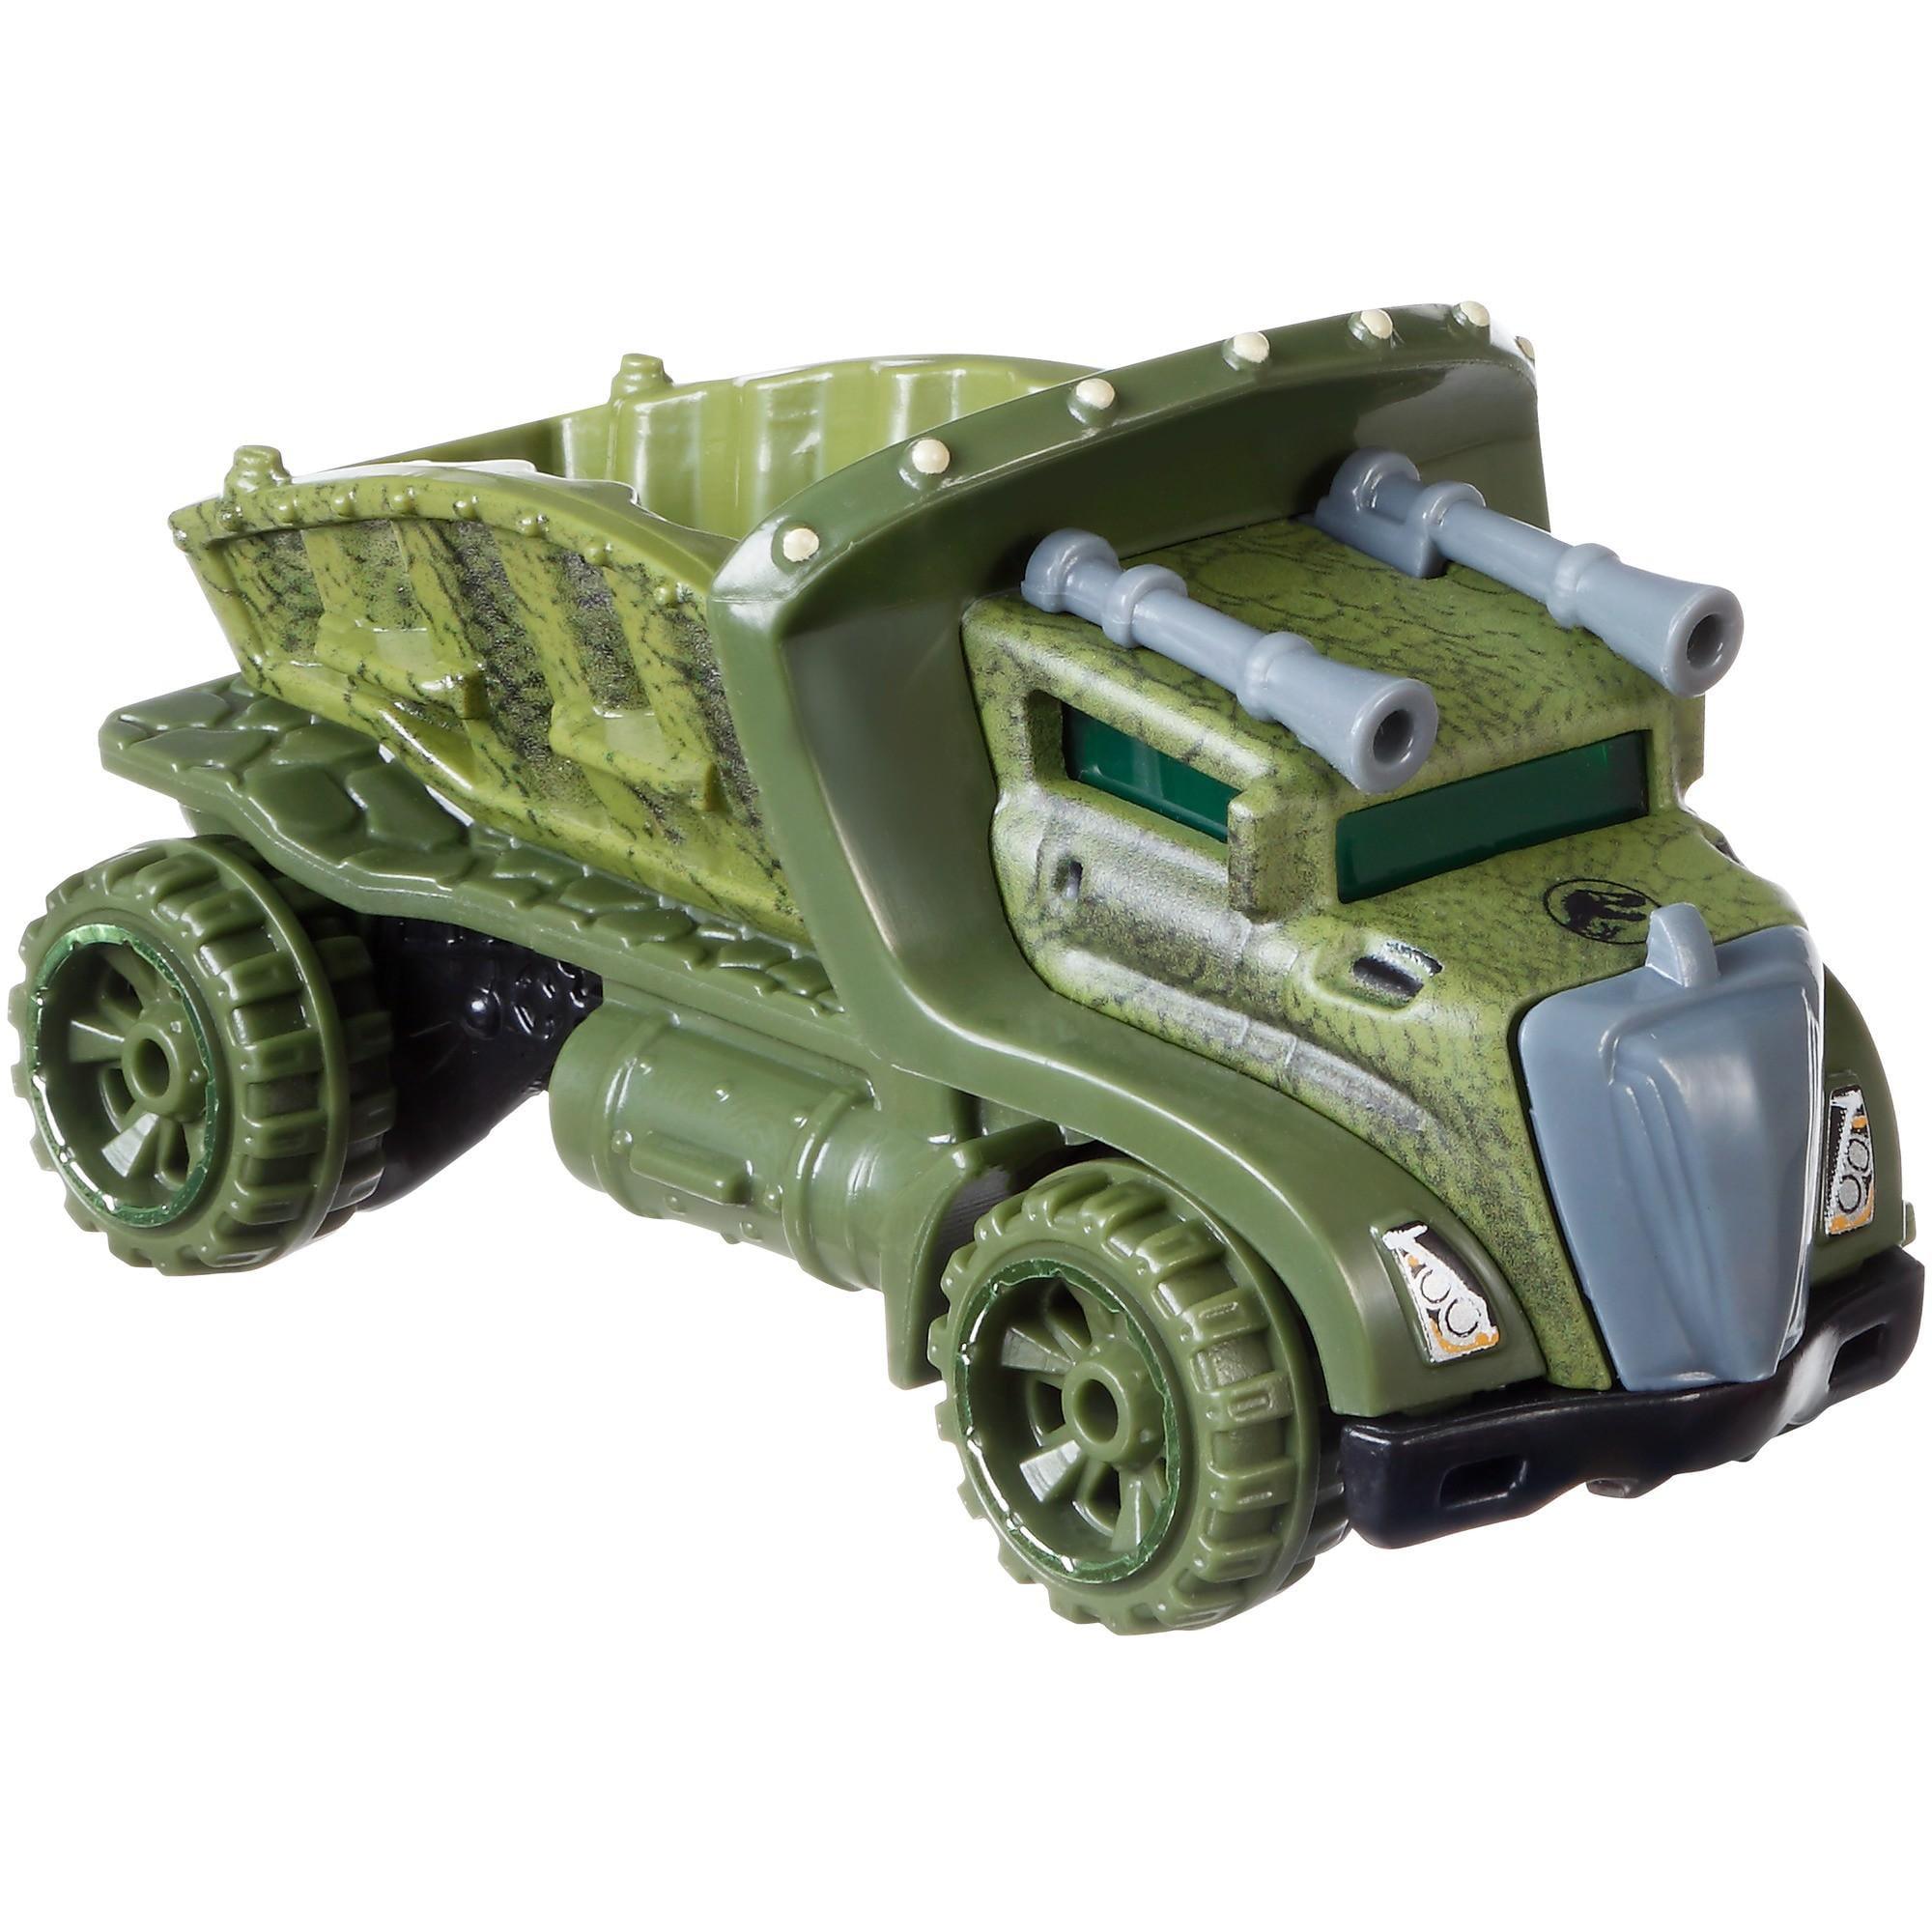 Hot Wheels Jurassic World Triceratops Vehicle by Mattel